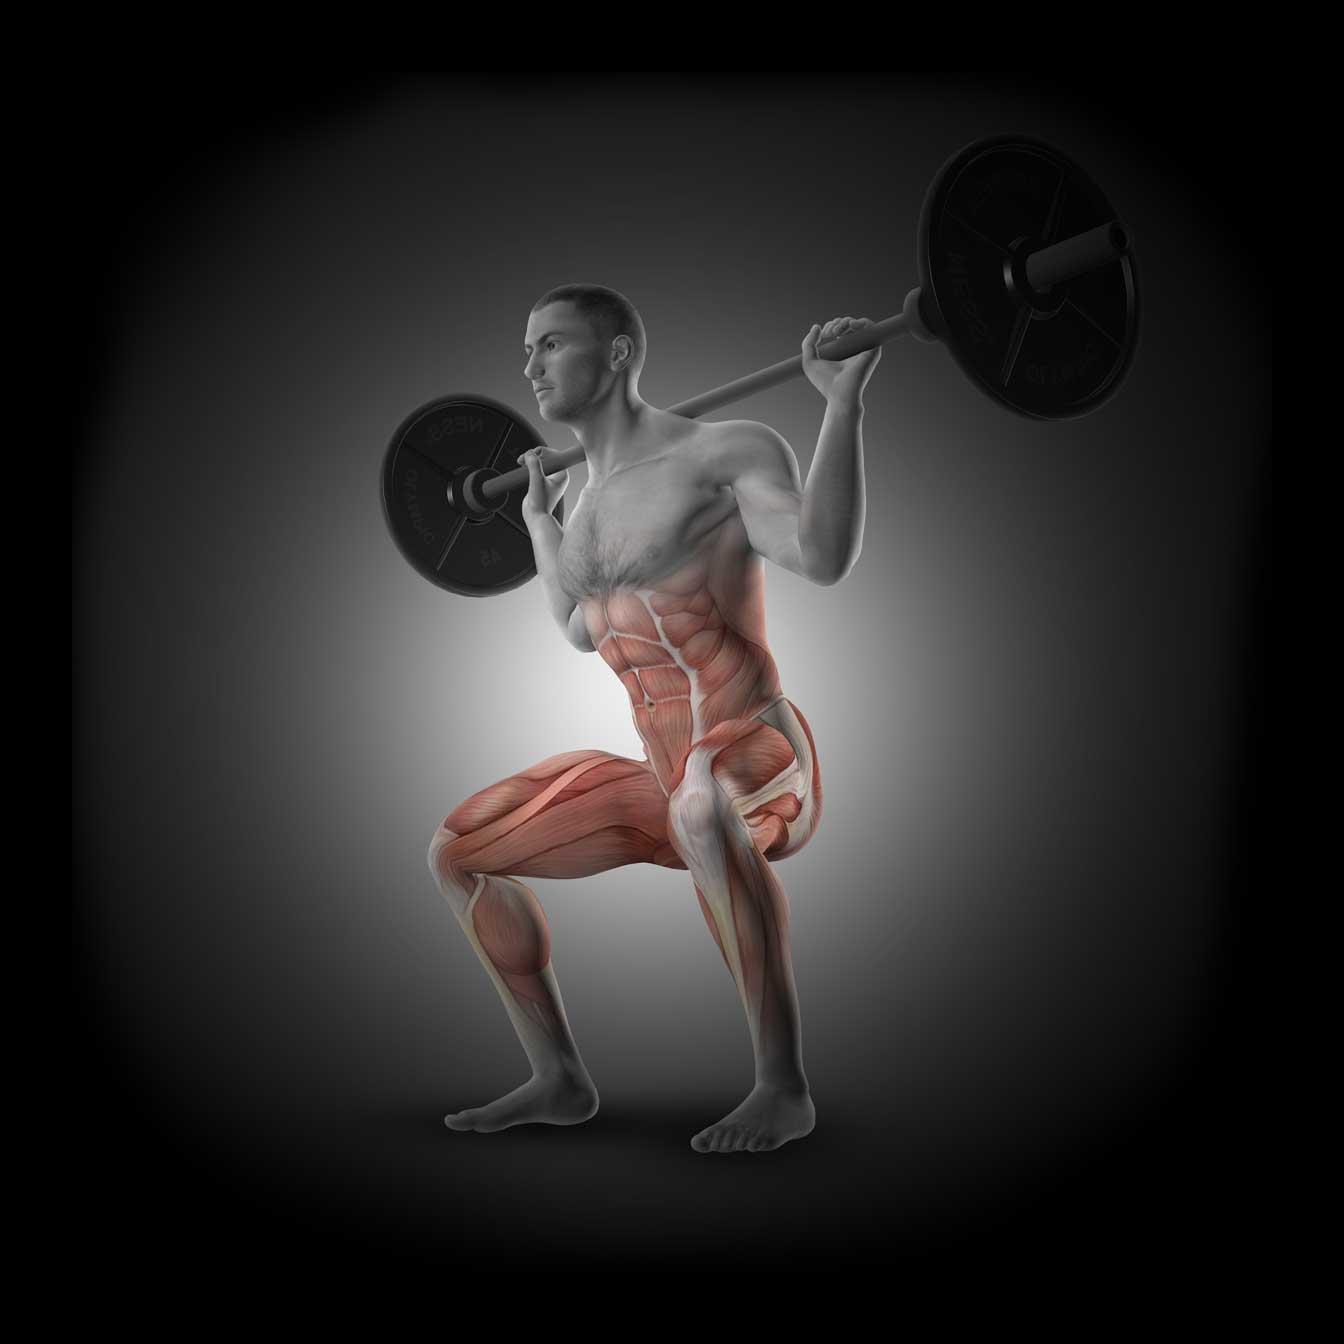 clinica de levantamento de peso olímpico